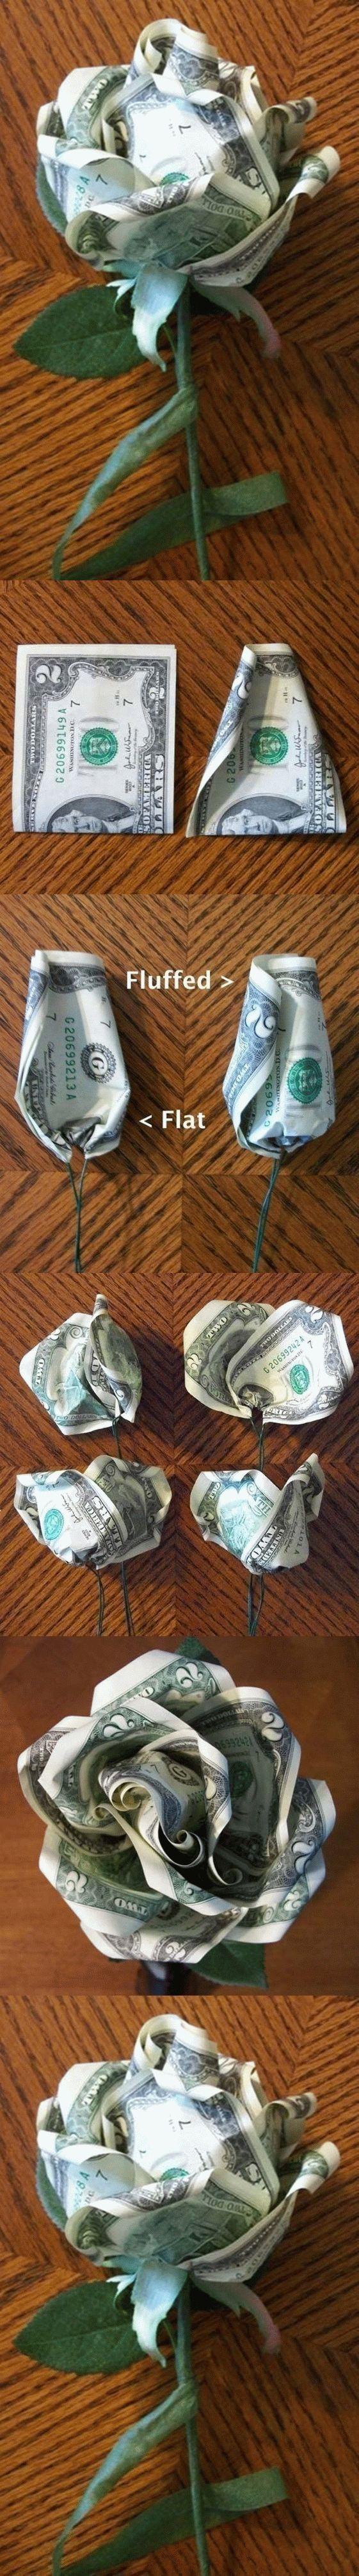 DIY Dollar Rose                                                                                                                                                      Mehr